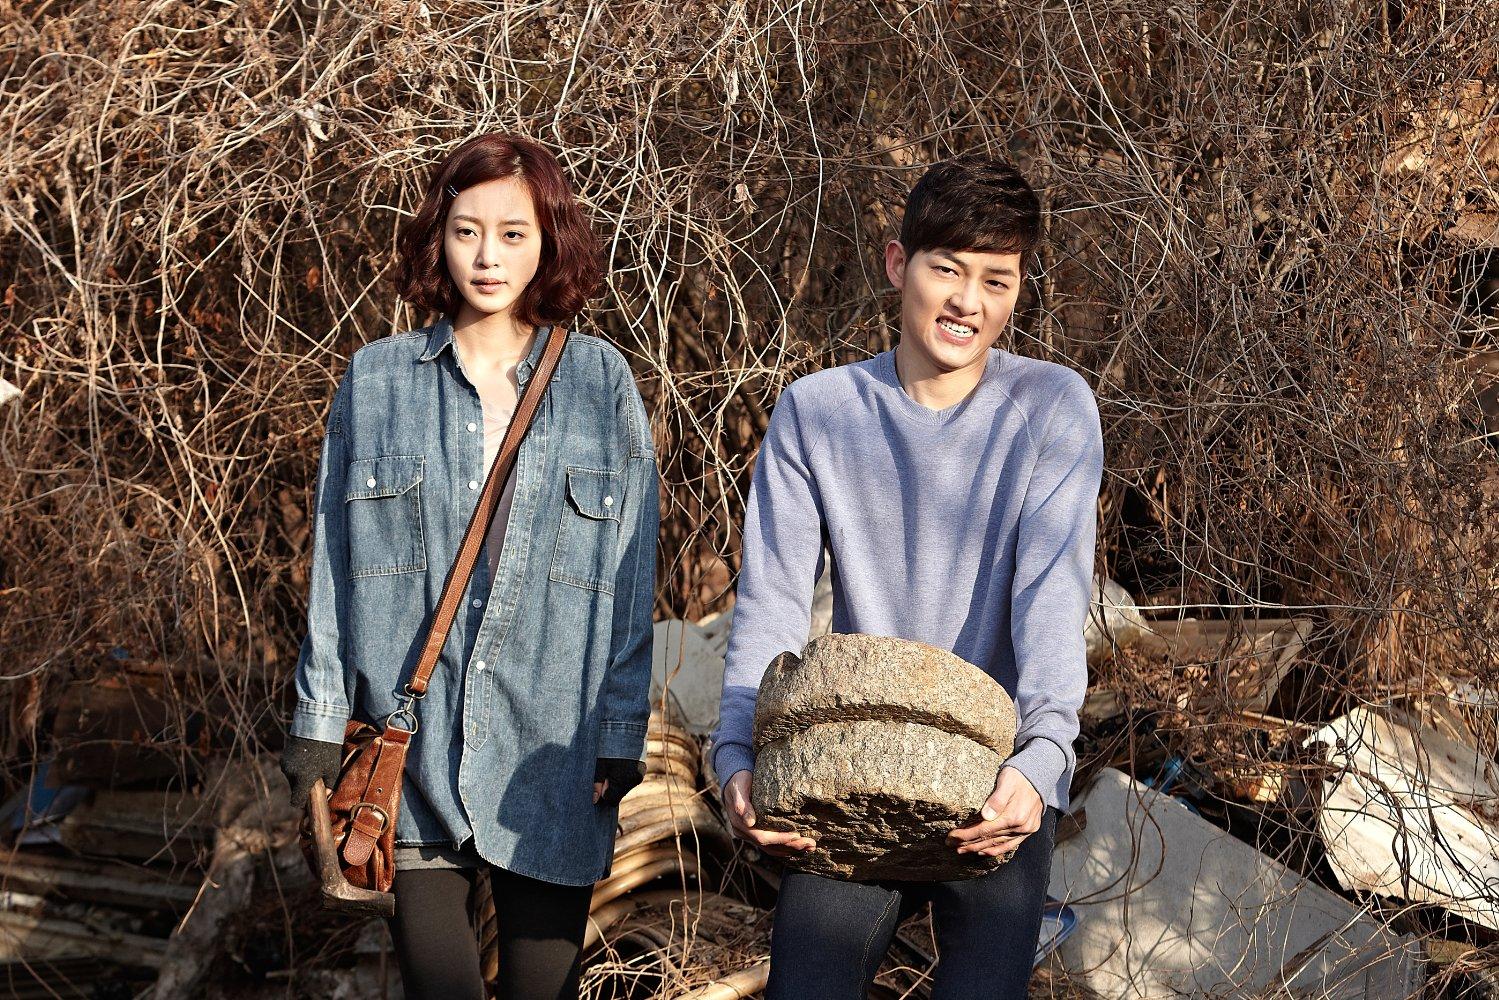 Joong-ki Song